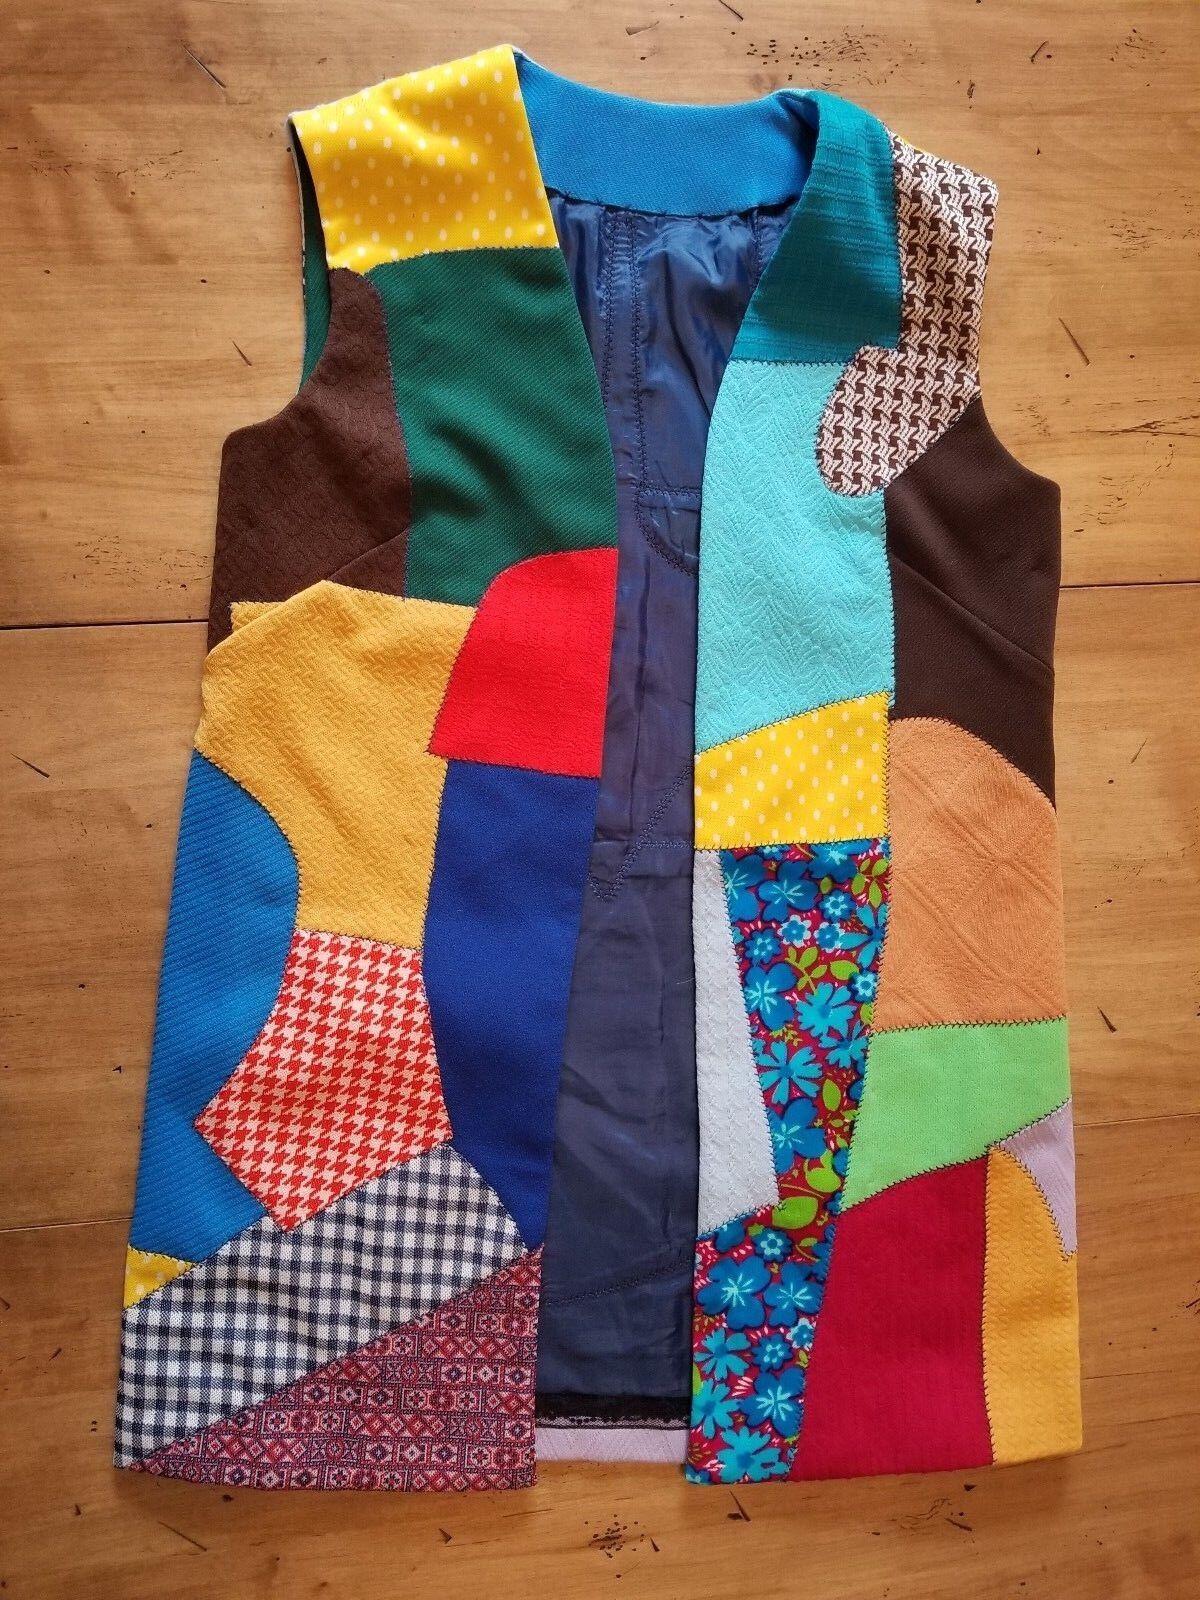 Retro Crazy Quilt Handmade Long Vest Funky Bright 60's 70's Groovy VTG Hippie